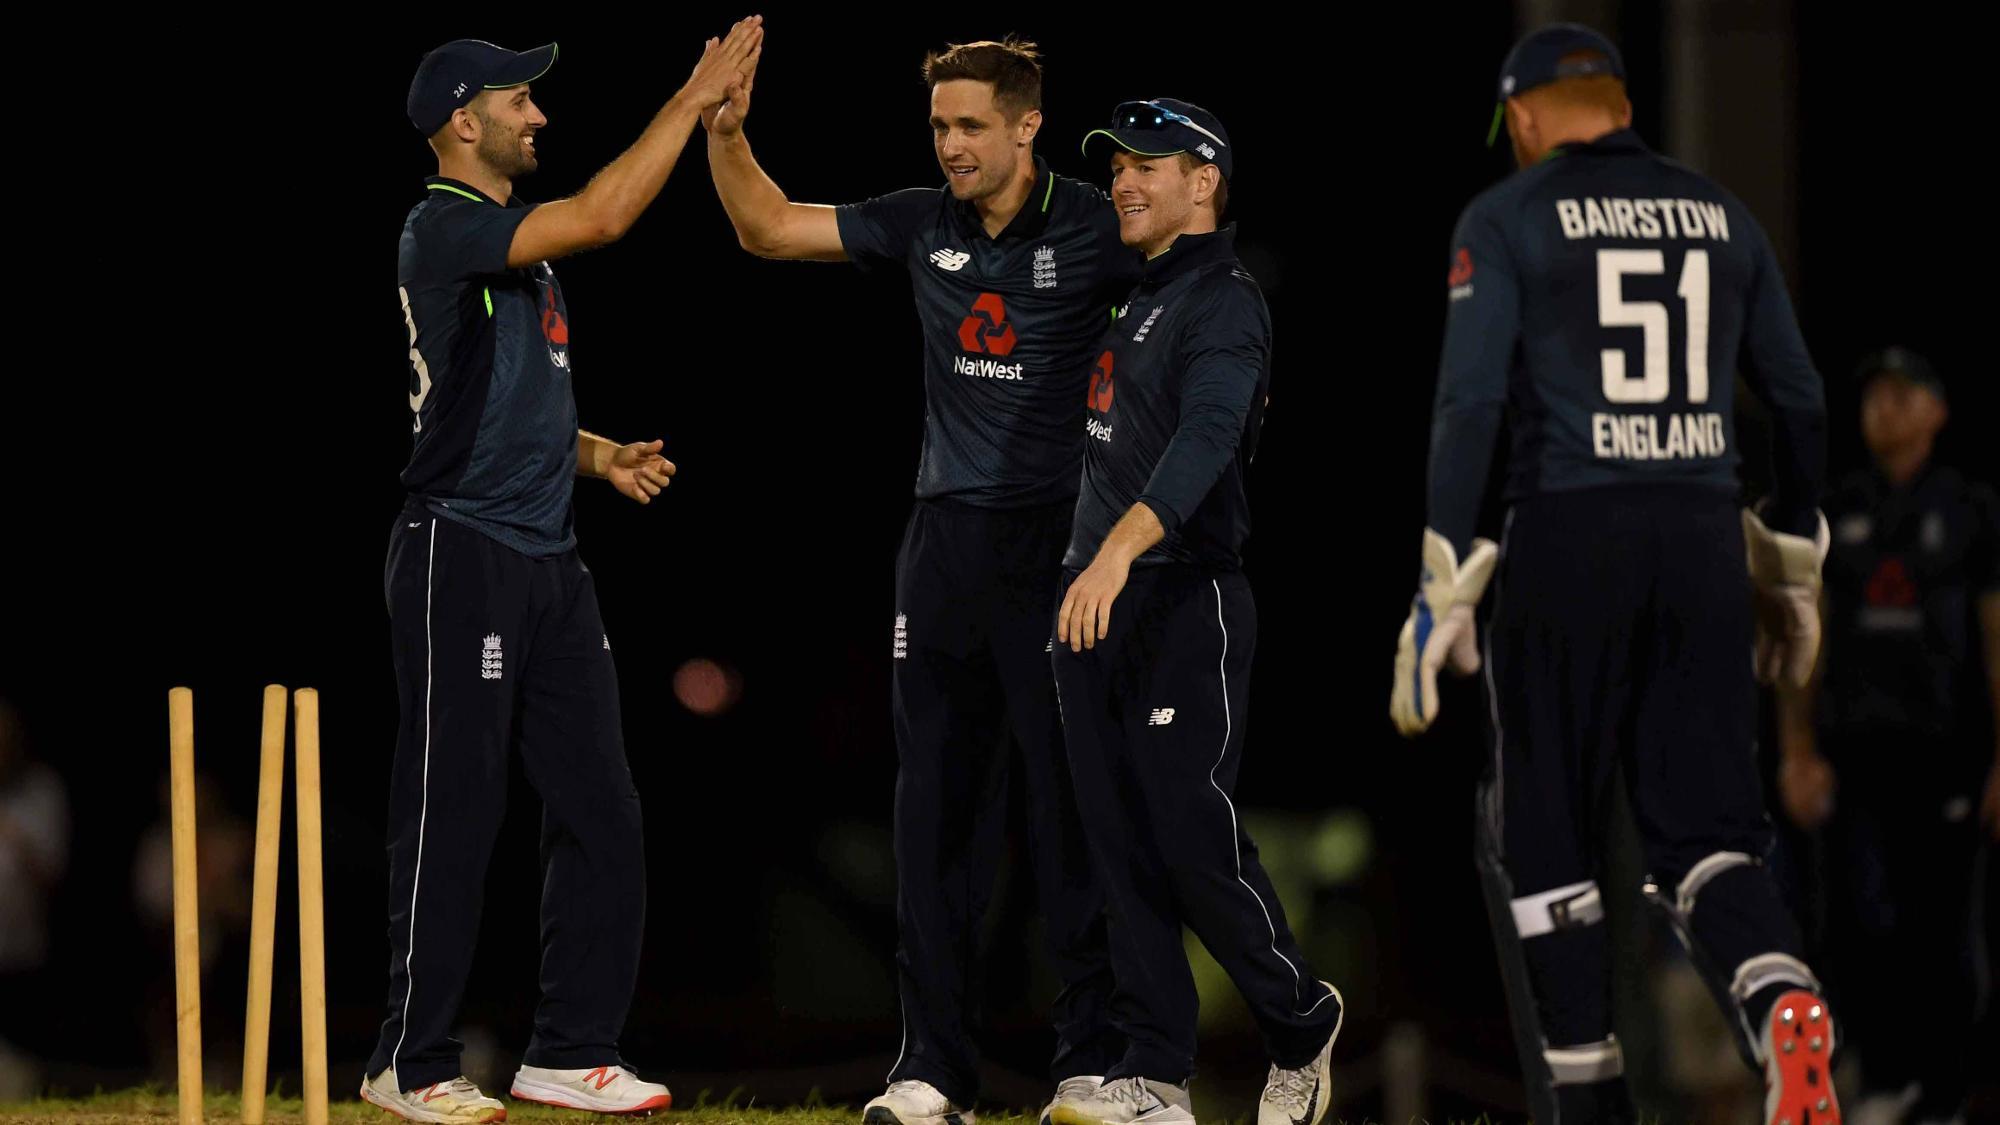 Gavaskar picks England over India as World Cup favourites